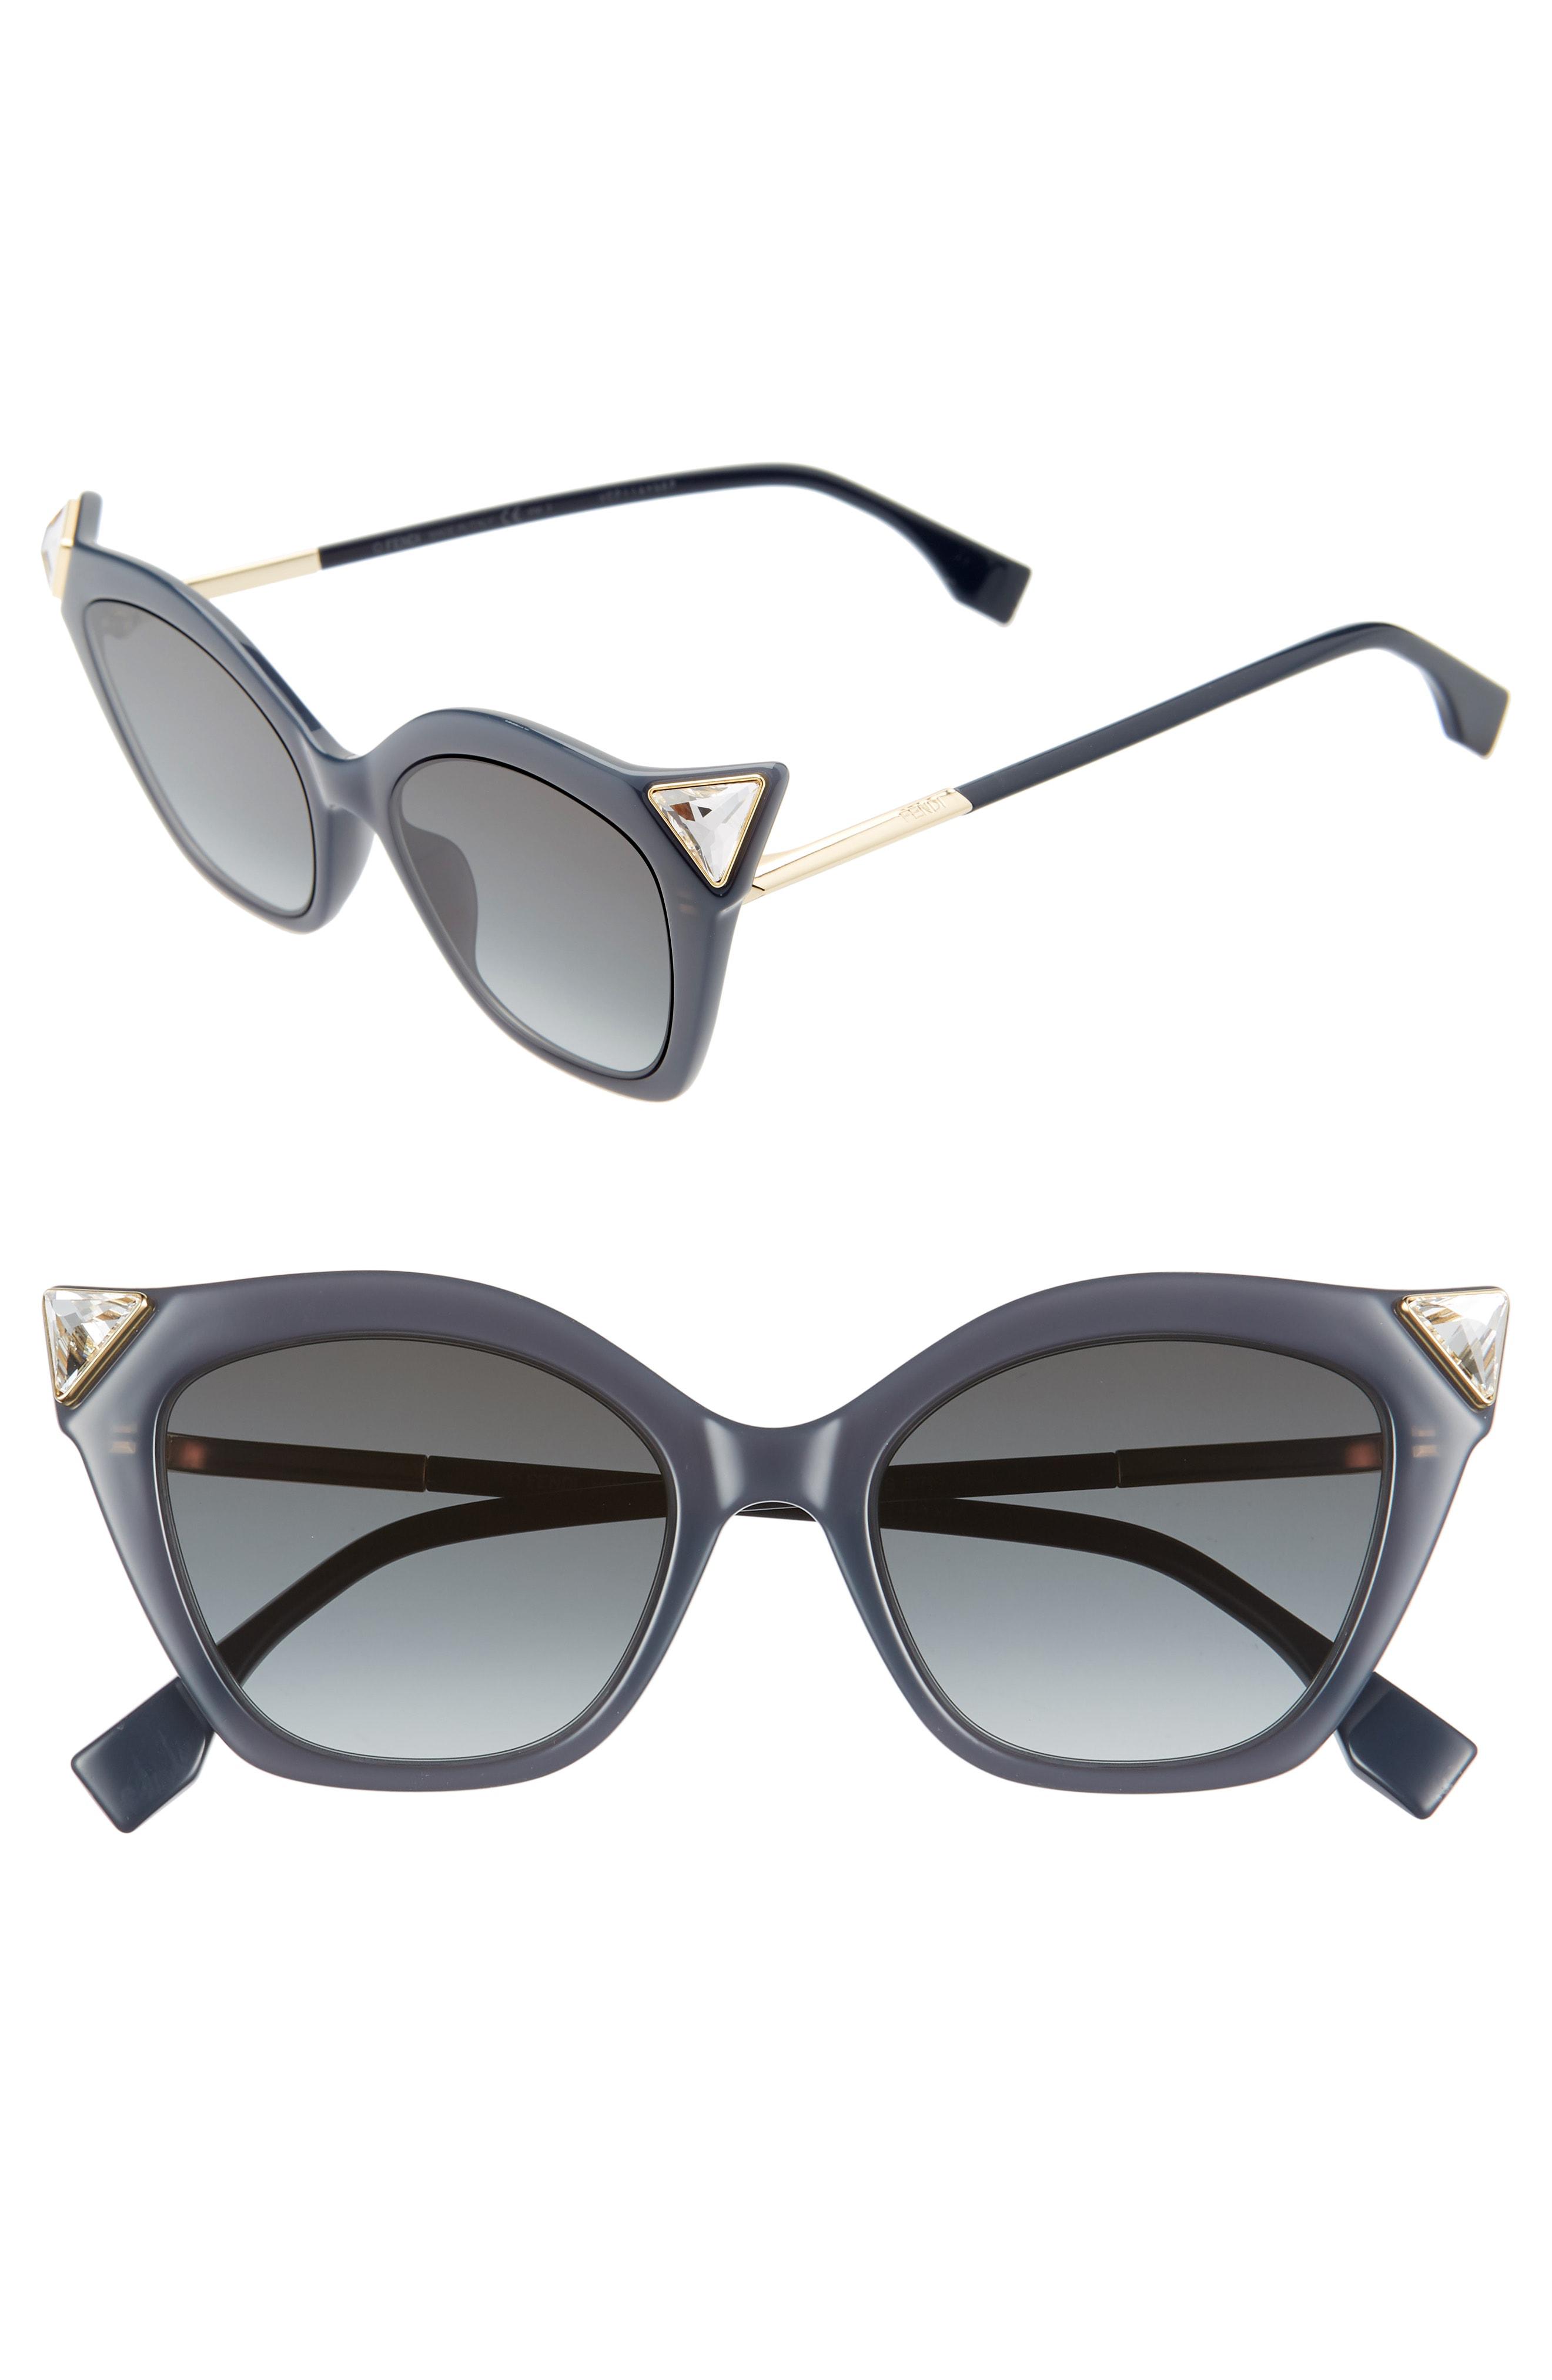 ffac5c0e5b2 Fendi 52Mm Gradient Cat Eye Sunglasses - Black